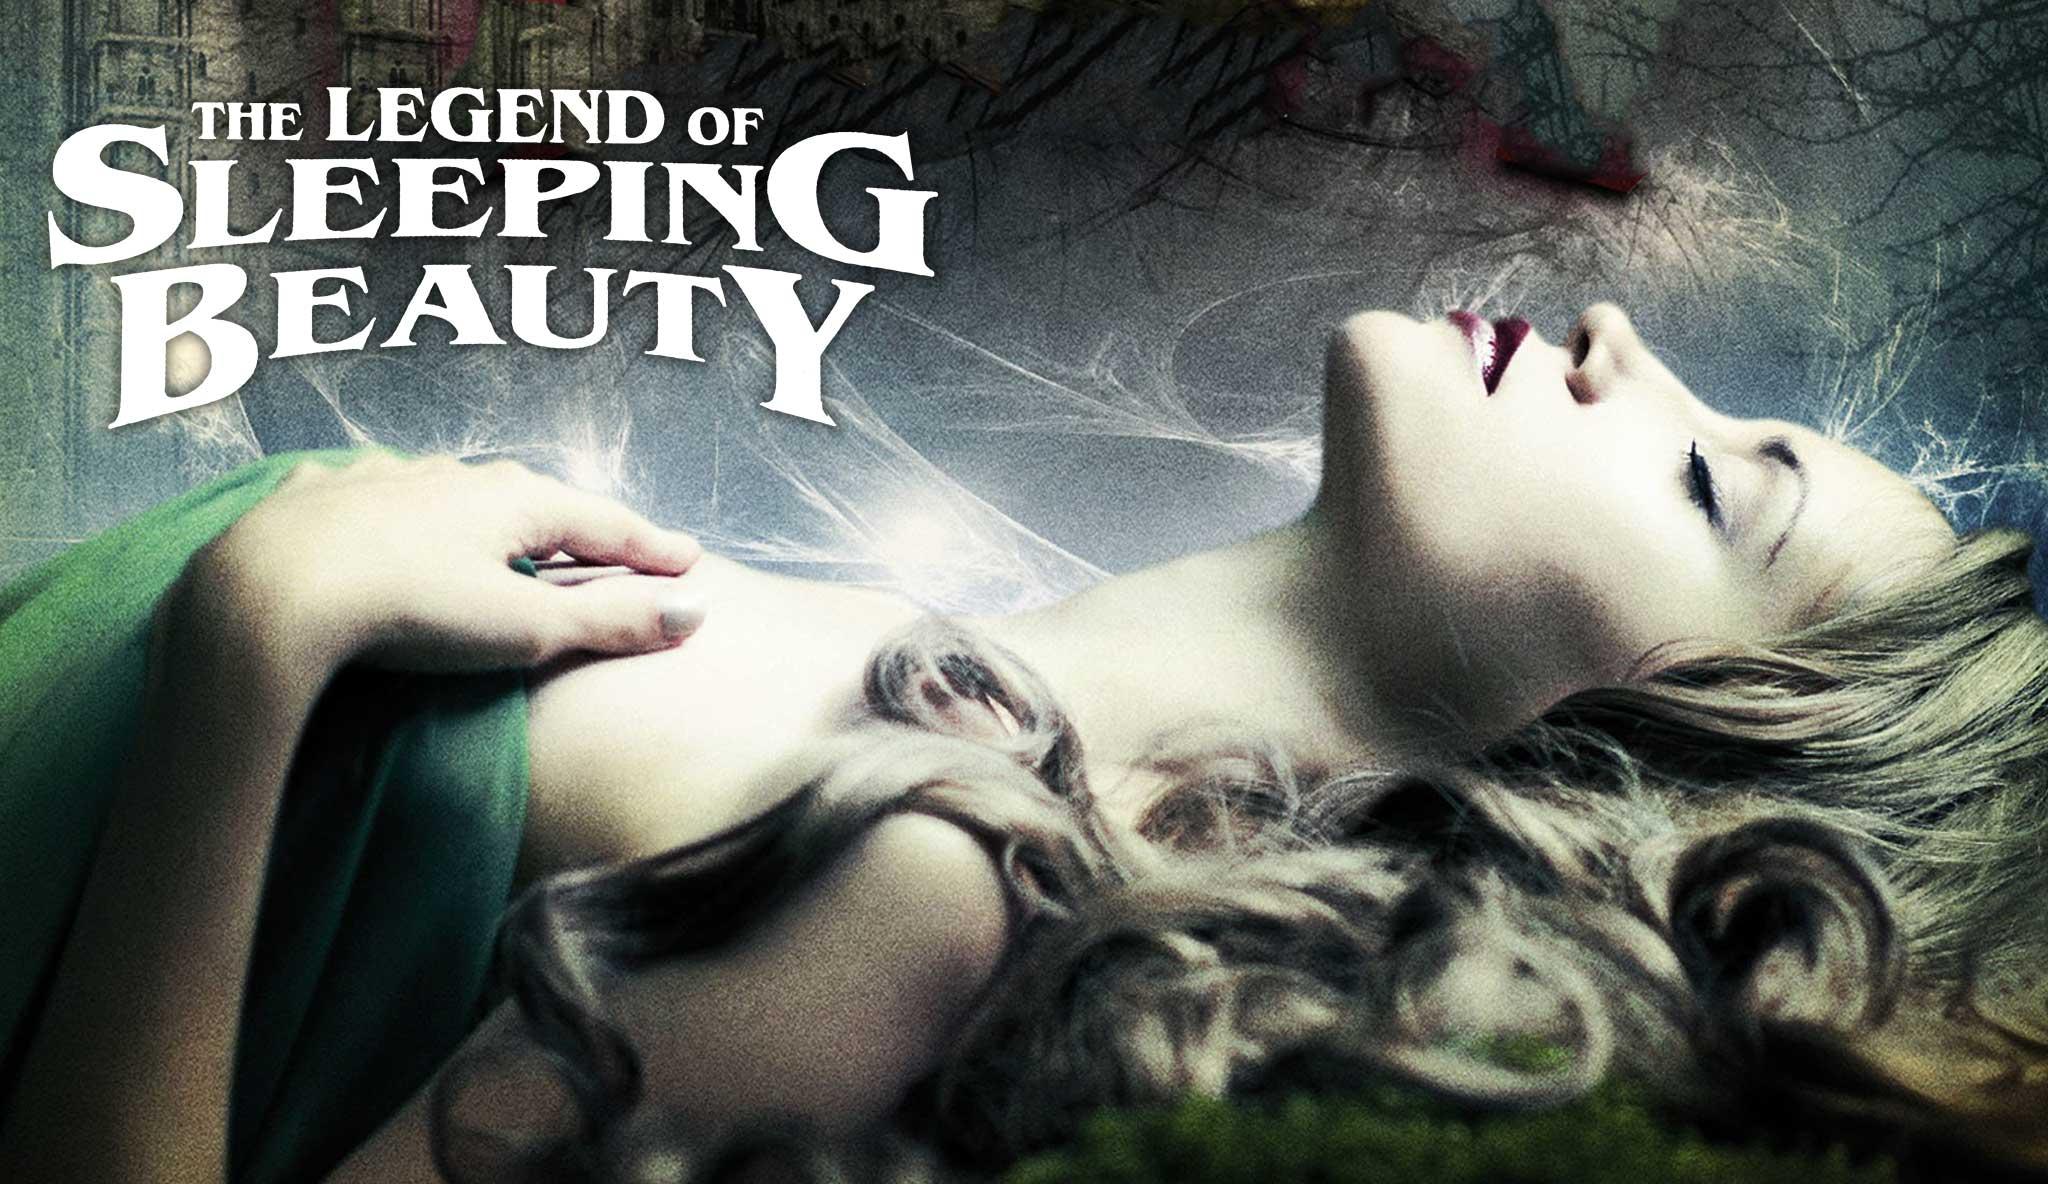 the-legend-of-sleeping-beauty-dornroschen\header.jpg